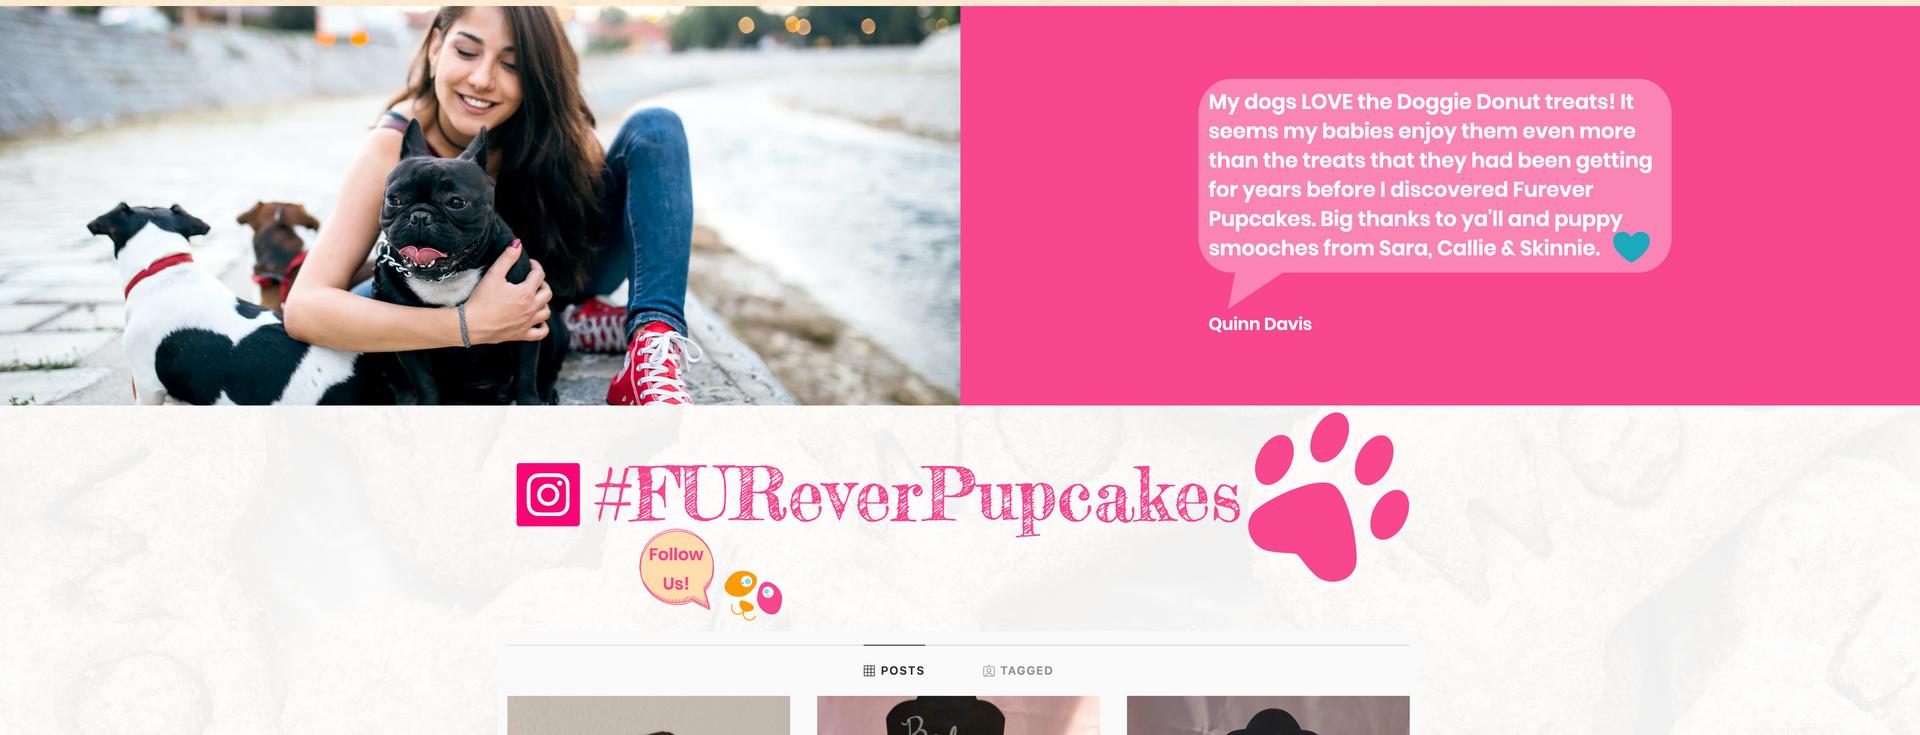 Furever Pupcakes